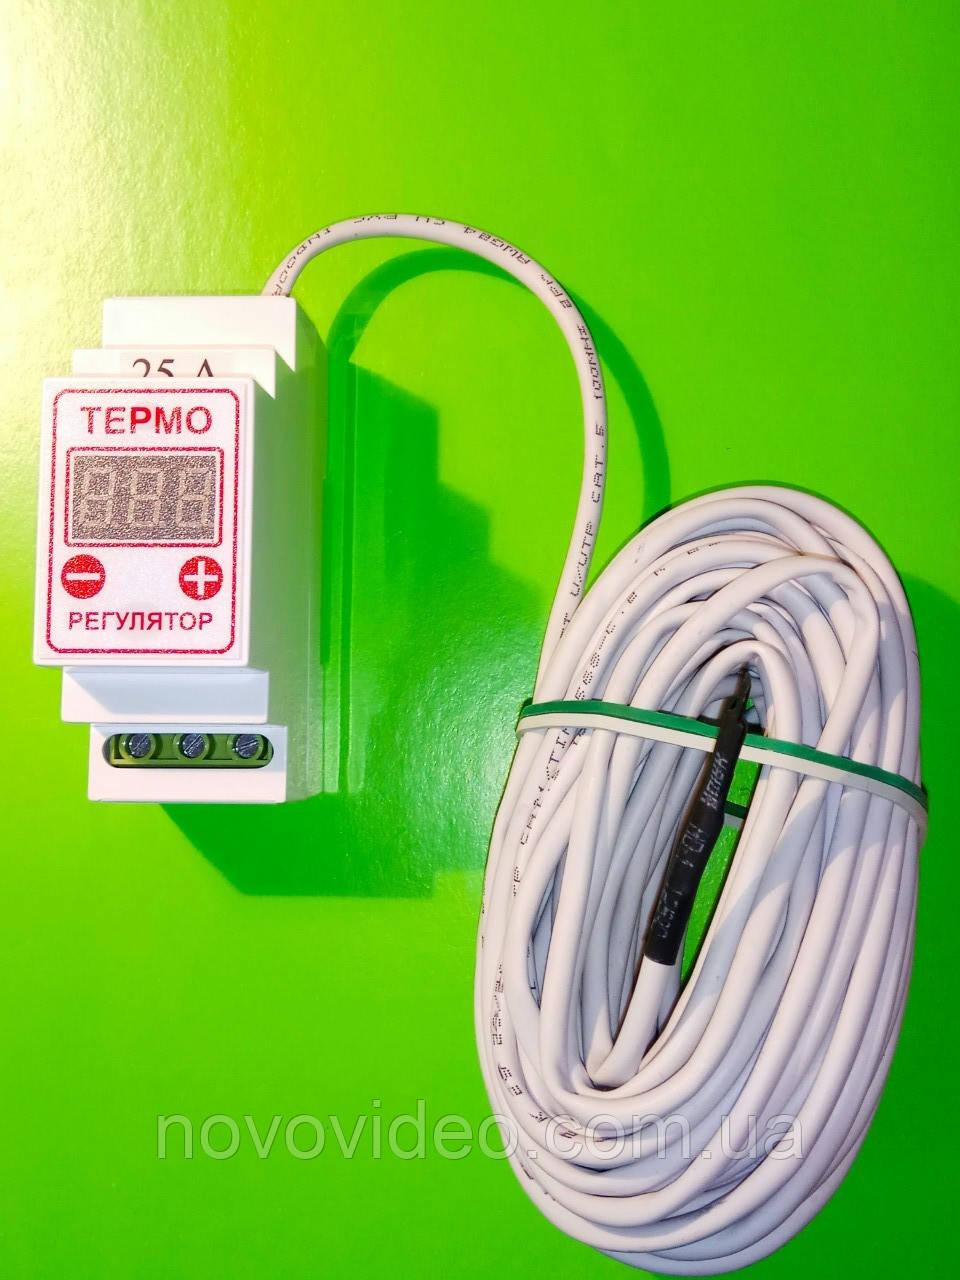 Цифровой терморегулятор Цтрд-5-2ч для теплого пола с датчиком 10 метров